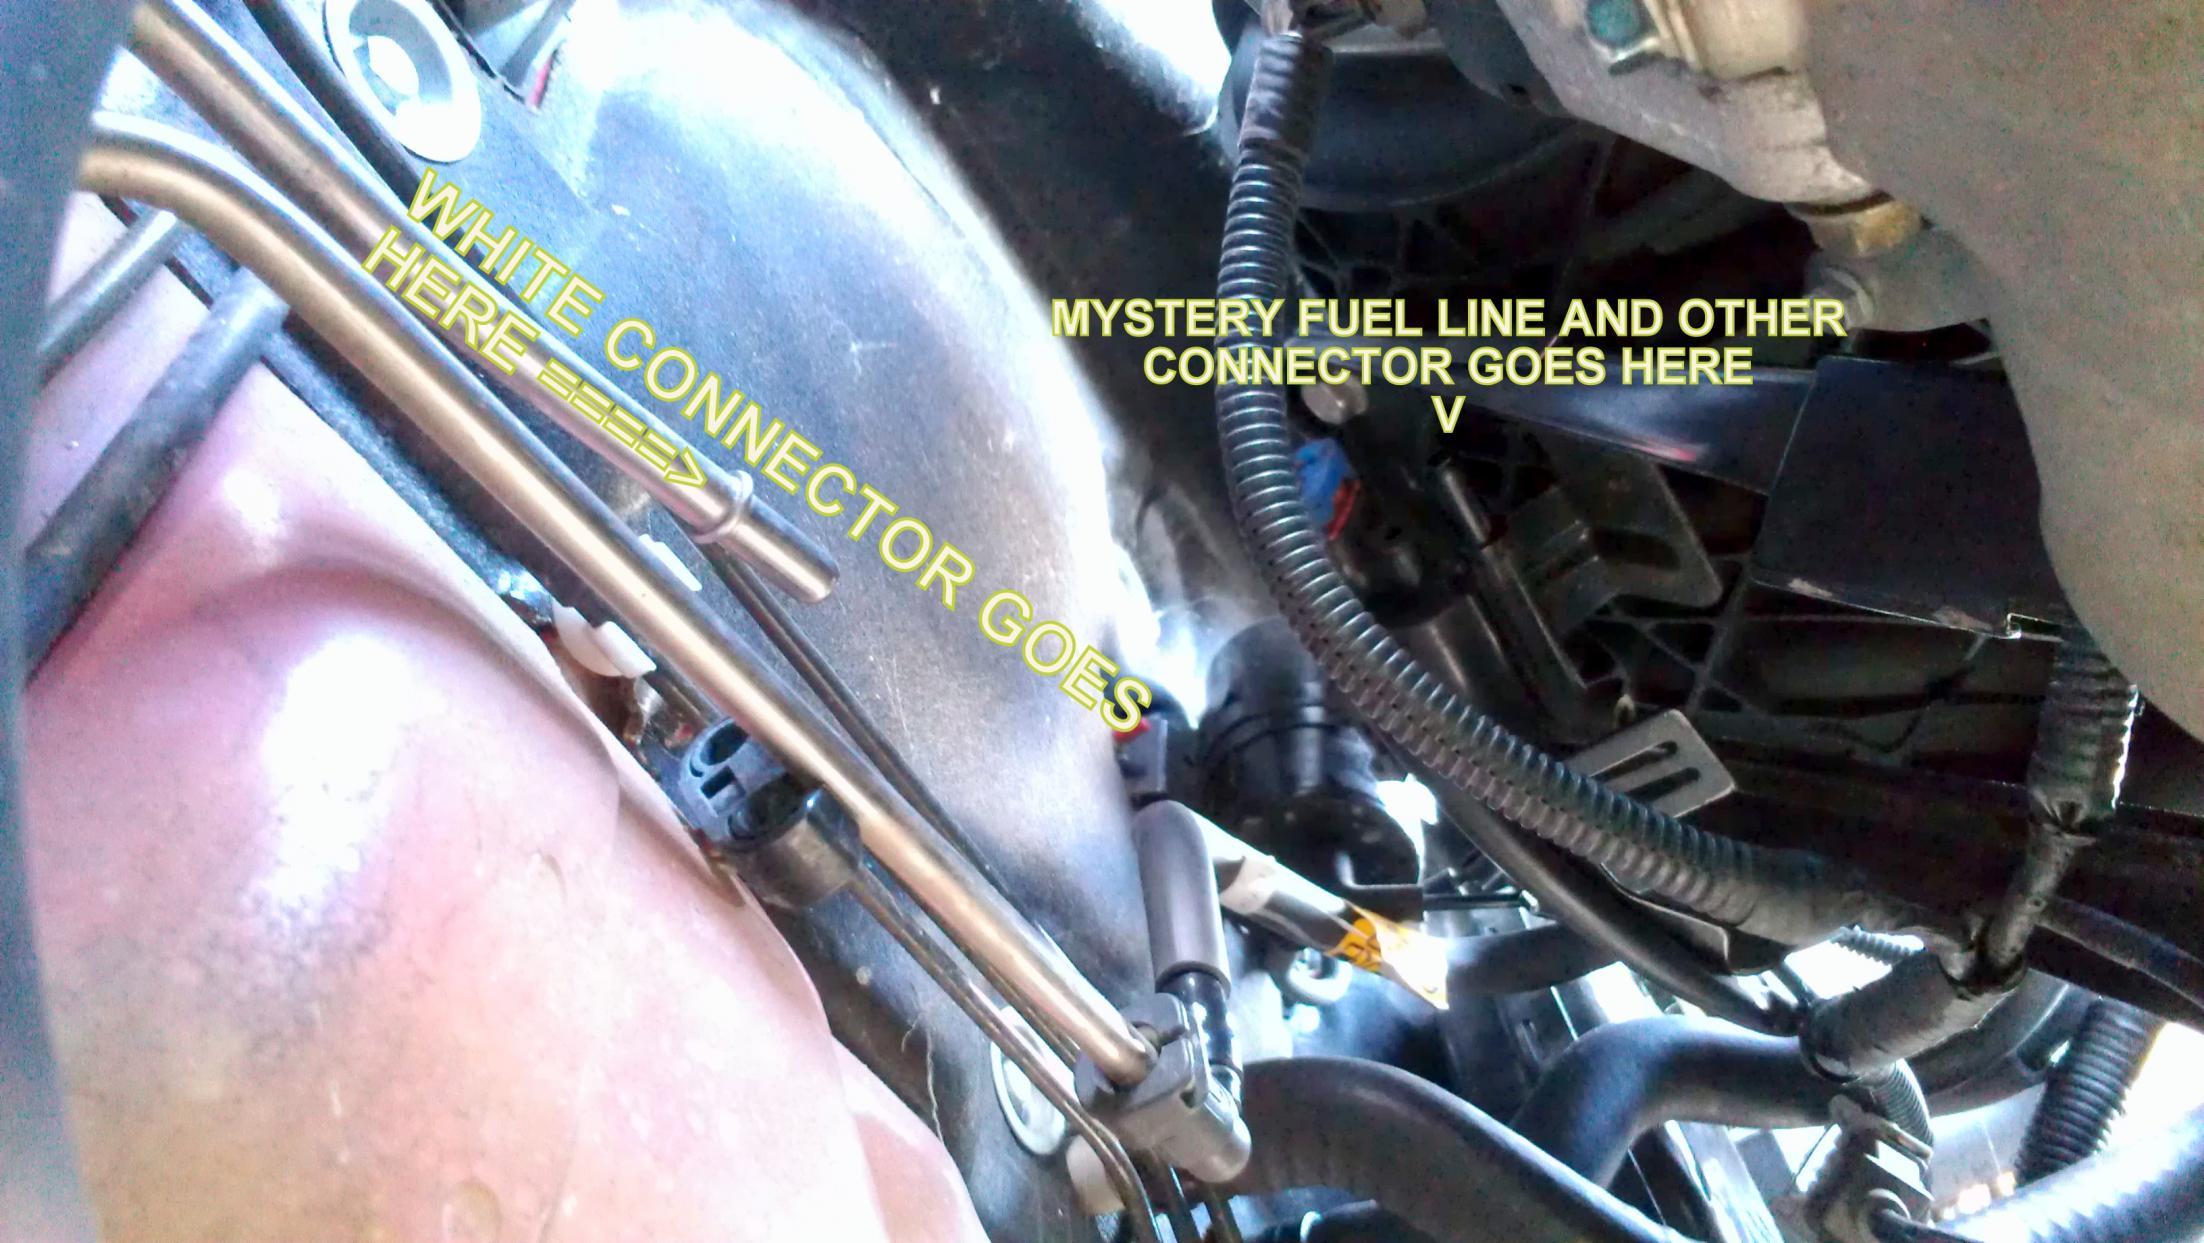 Chevy Aveo Fuel Line Routing Wiring Diagrams 22re Timing Chain Diagram Http Autozonecom Autozone Repairinfo Replacement Engine Compartment Help Rh Aveoforum Com Brake 751 Bobcat